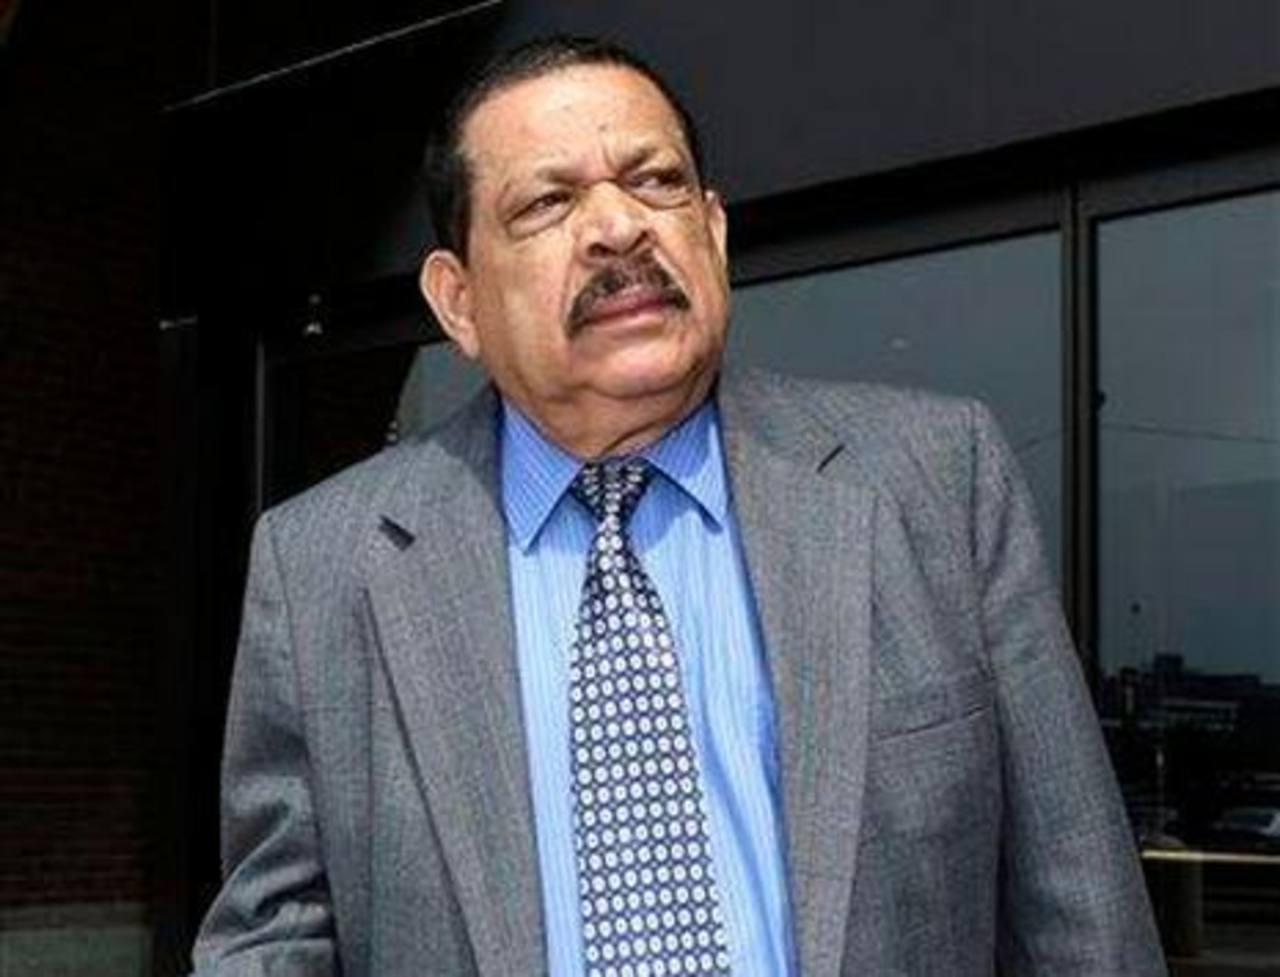 Condenan a 21 meses de cárcel a exmilitar salvadoreño